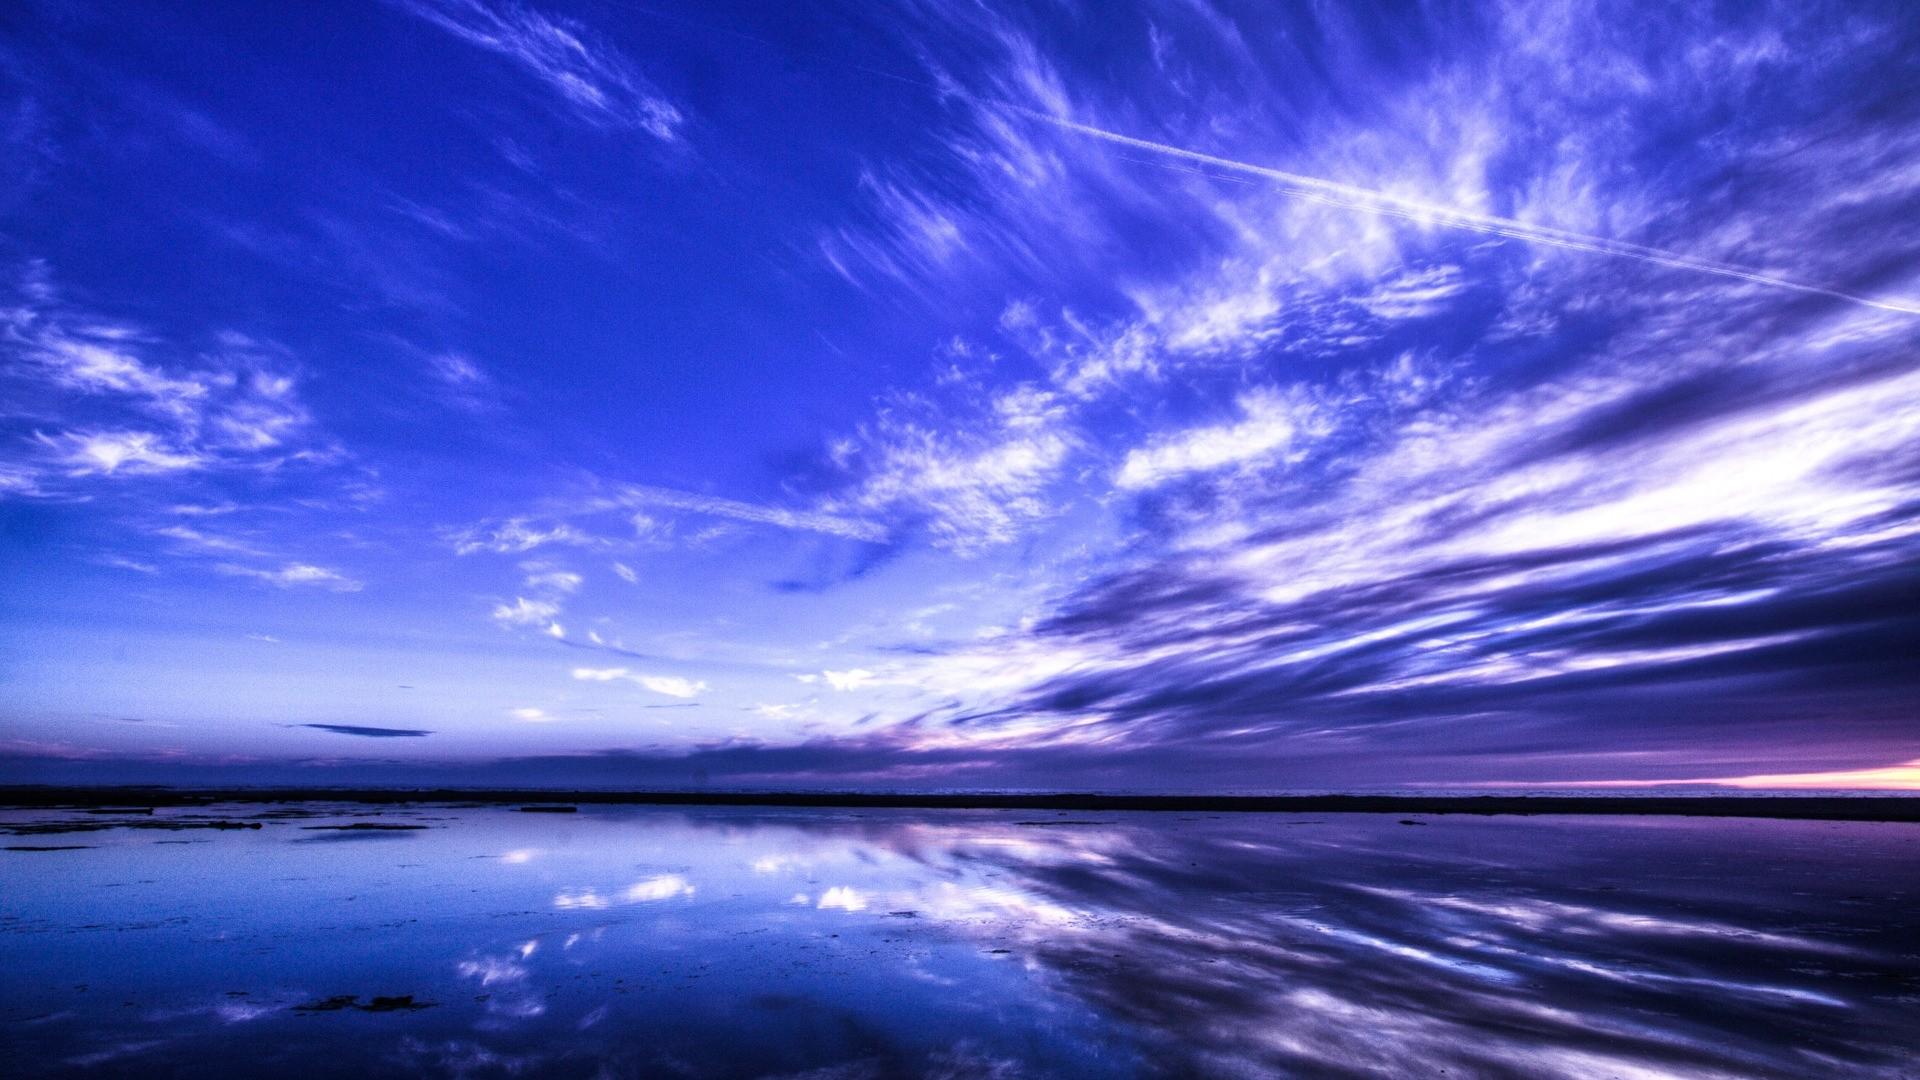 Blue Cloud hd wallpaper download